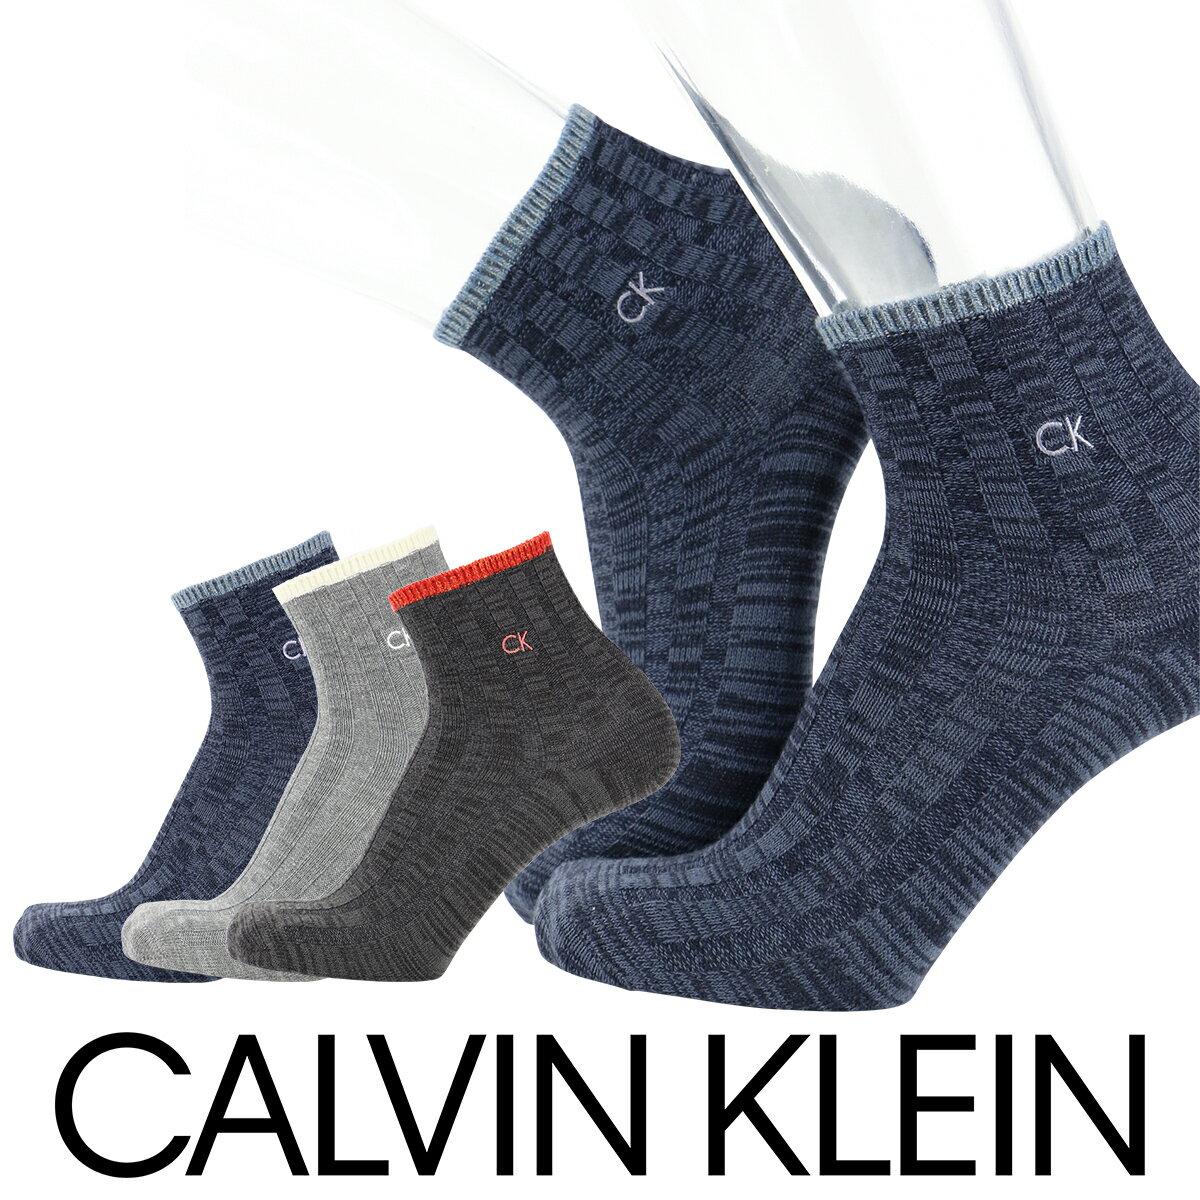 Calvin Klein ( カルバンクライン )Casual 毛混 メンズソックス ロゴ刺繍 メンズ カジュアル ショート丈 ソックス 靴下 男性 メンズ プレゼント 贈答 ギフト2525-441ポイント10倍